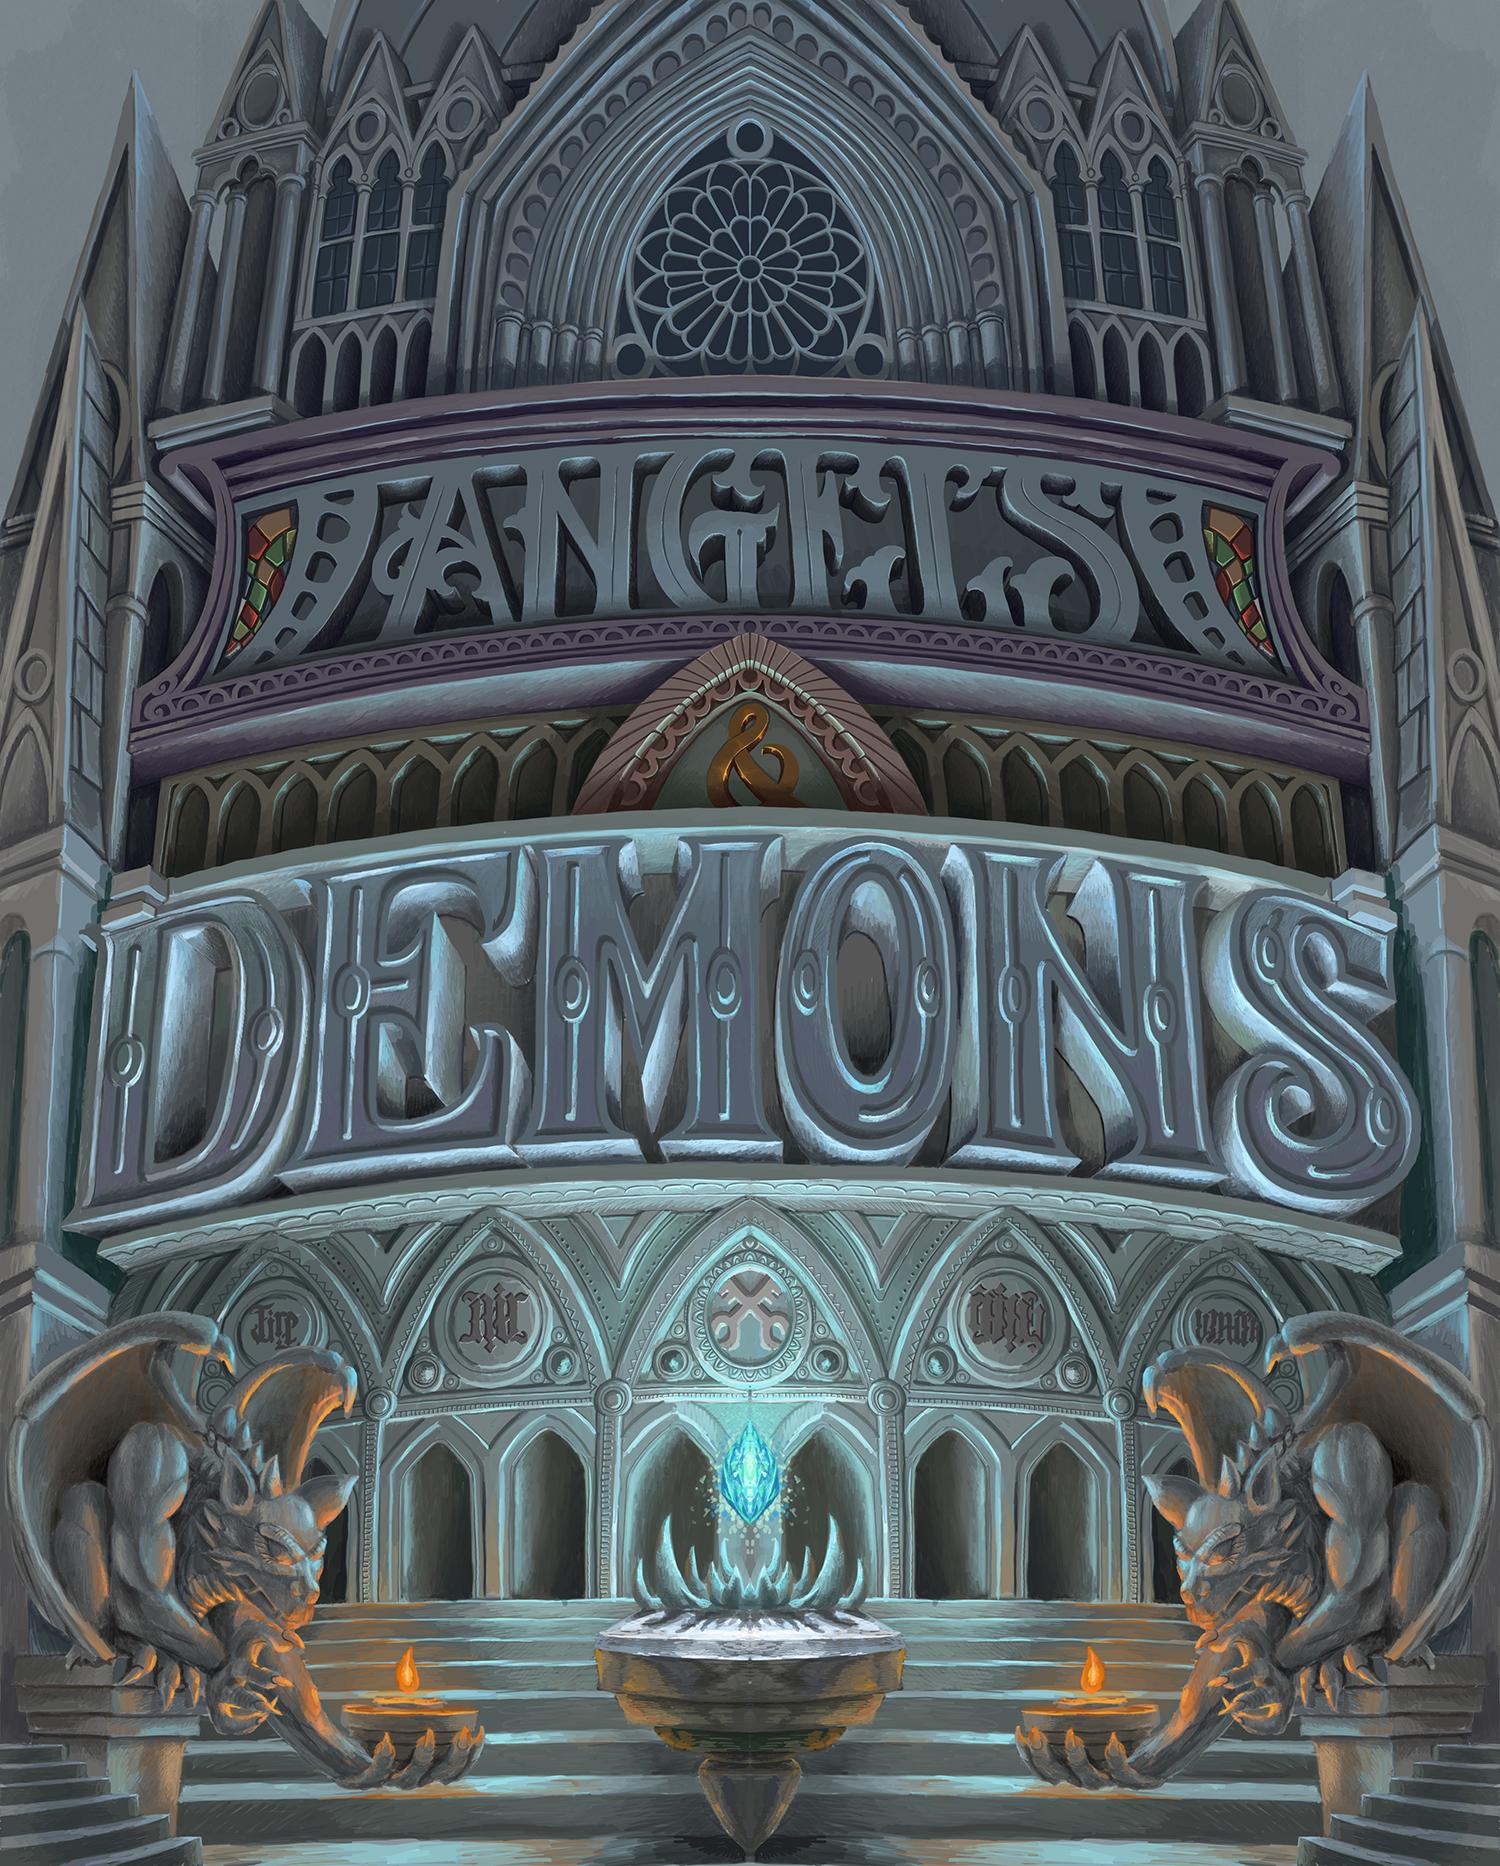 Angel demons